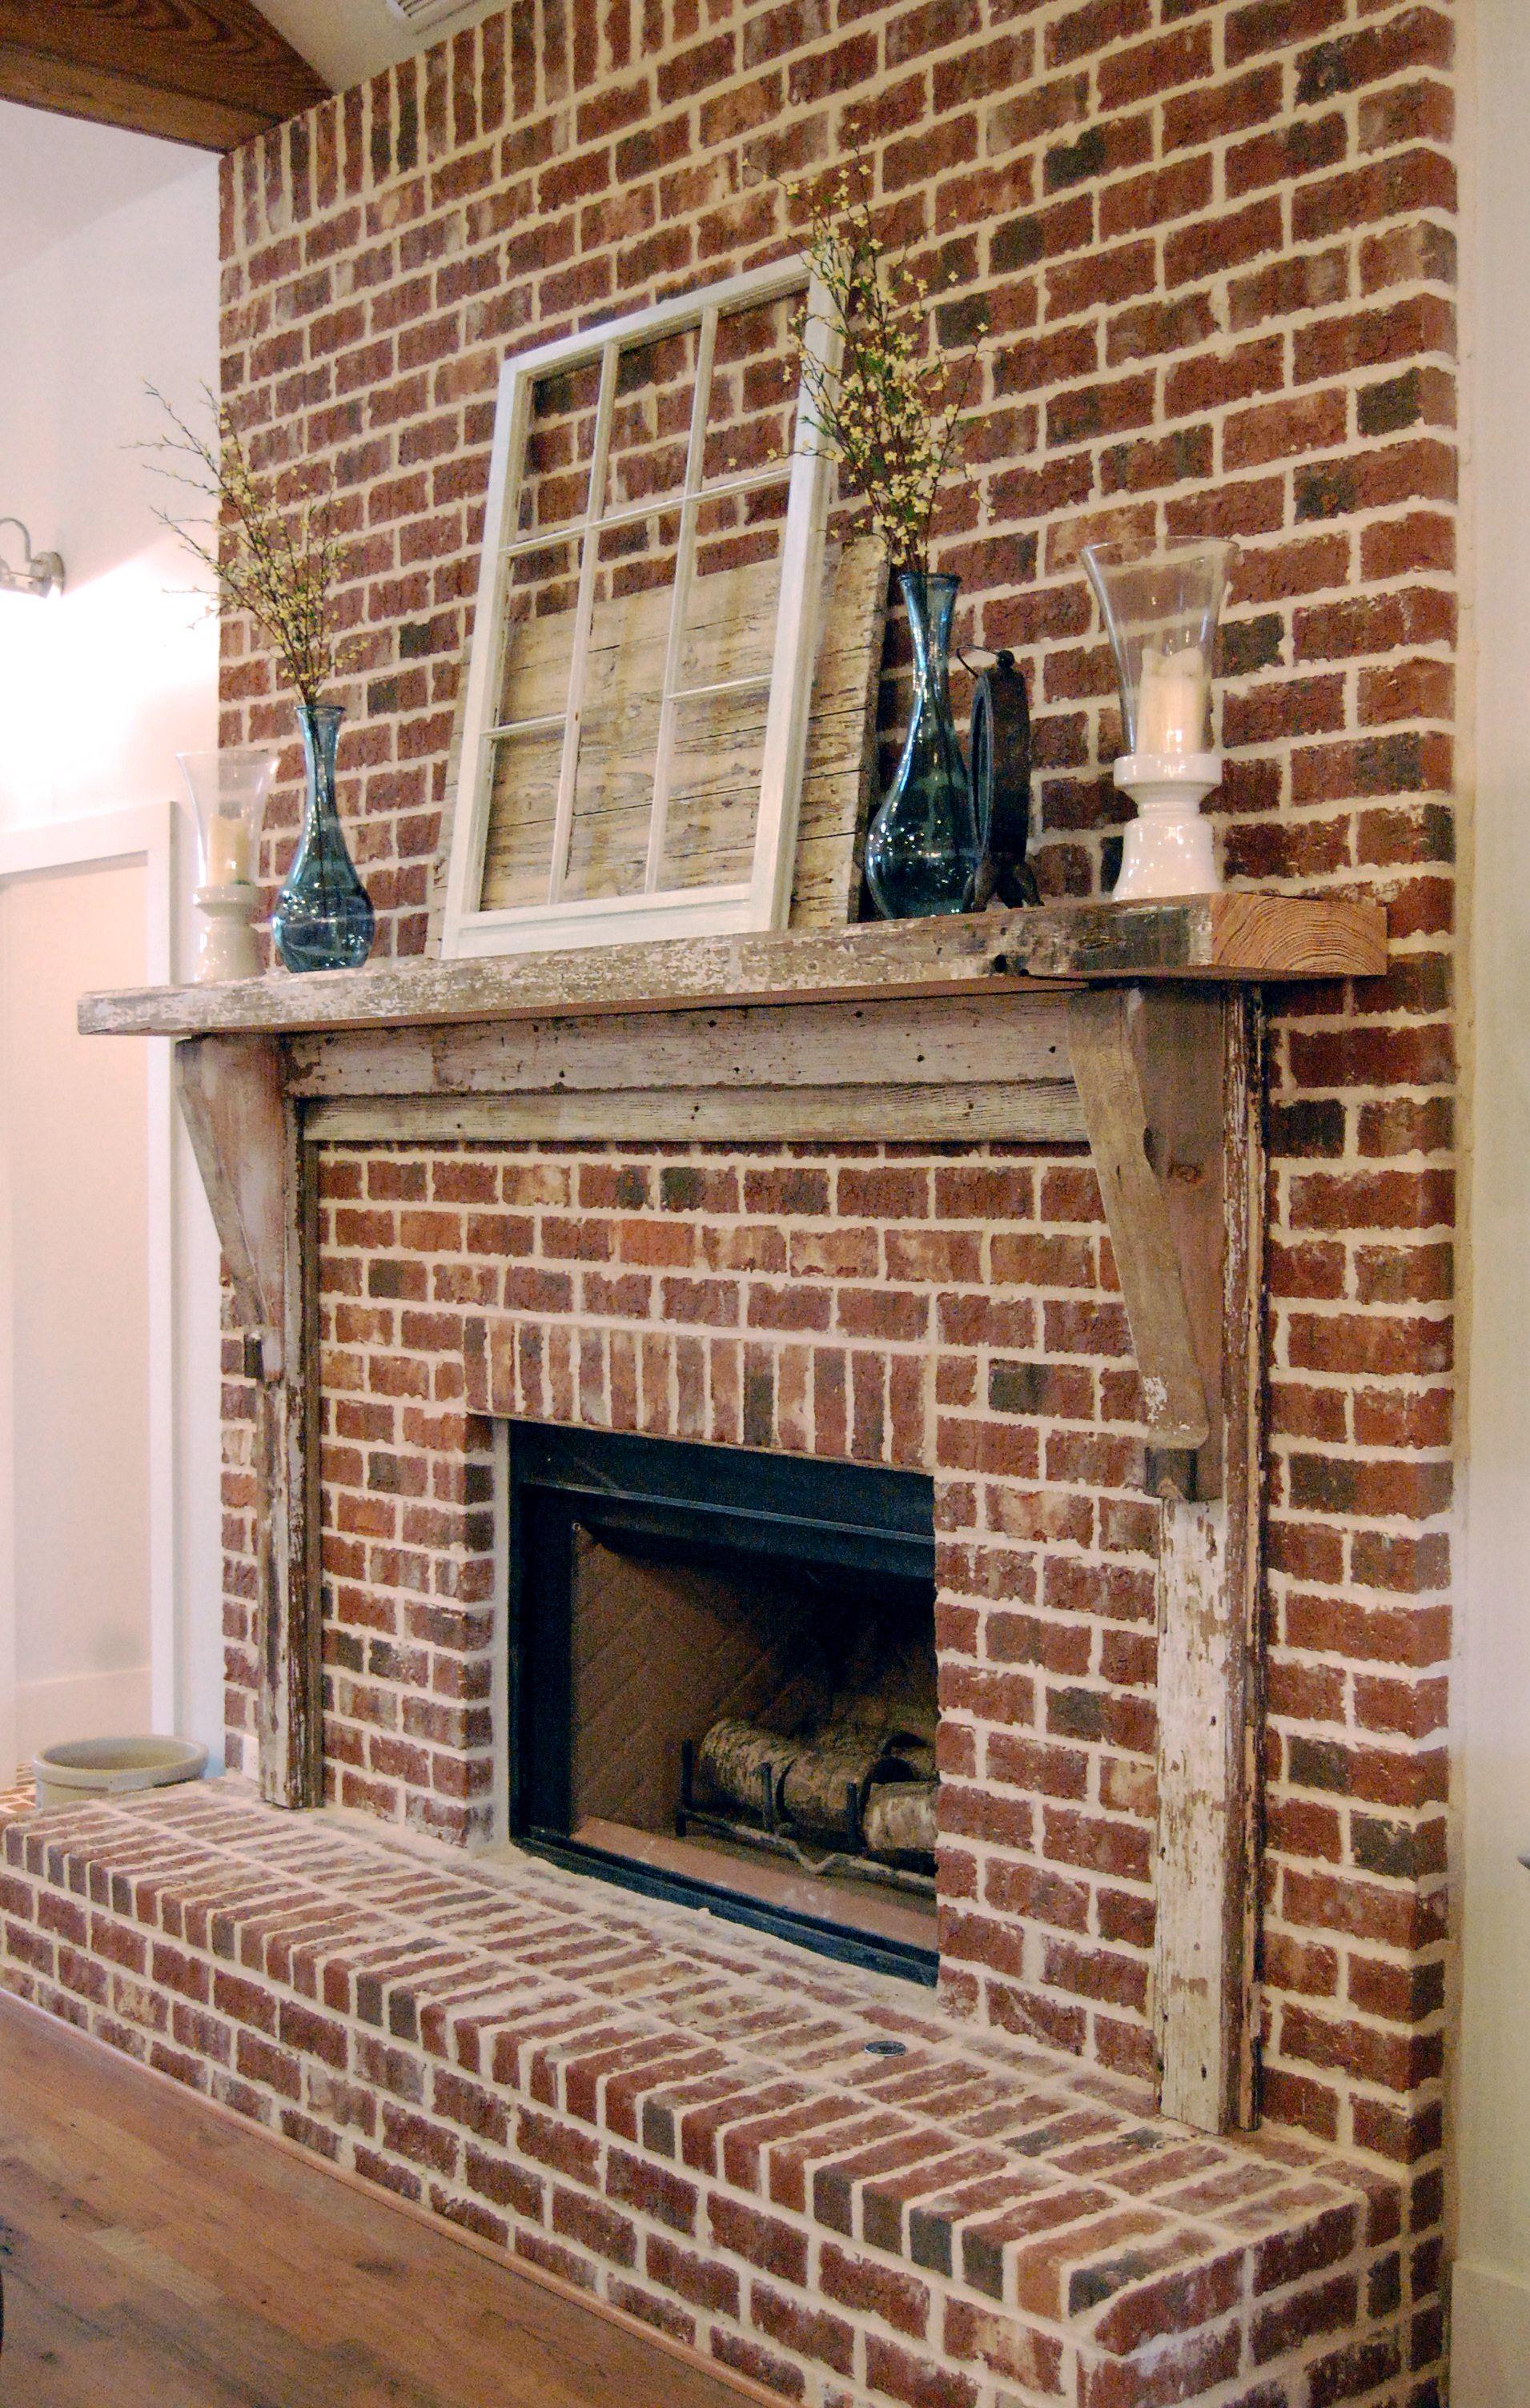 Reclaimed Wood Fireplace Mantel Designed By The Fresh Collaborative Brick Fireplace Decor Fireplace Garden Farmhouse Fireplace